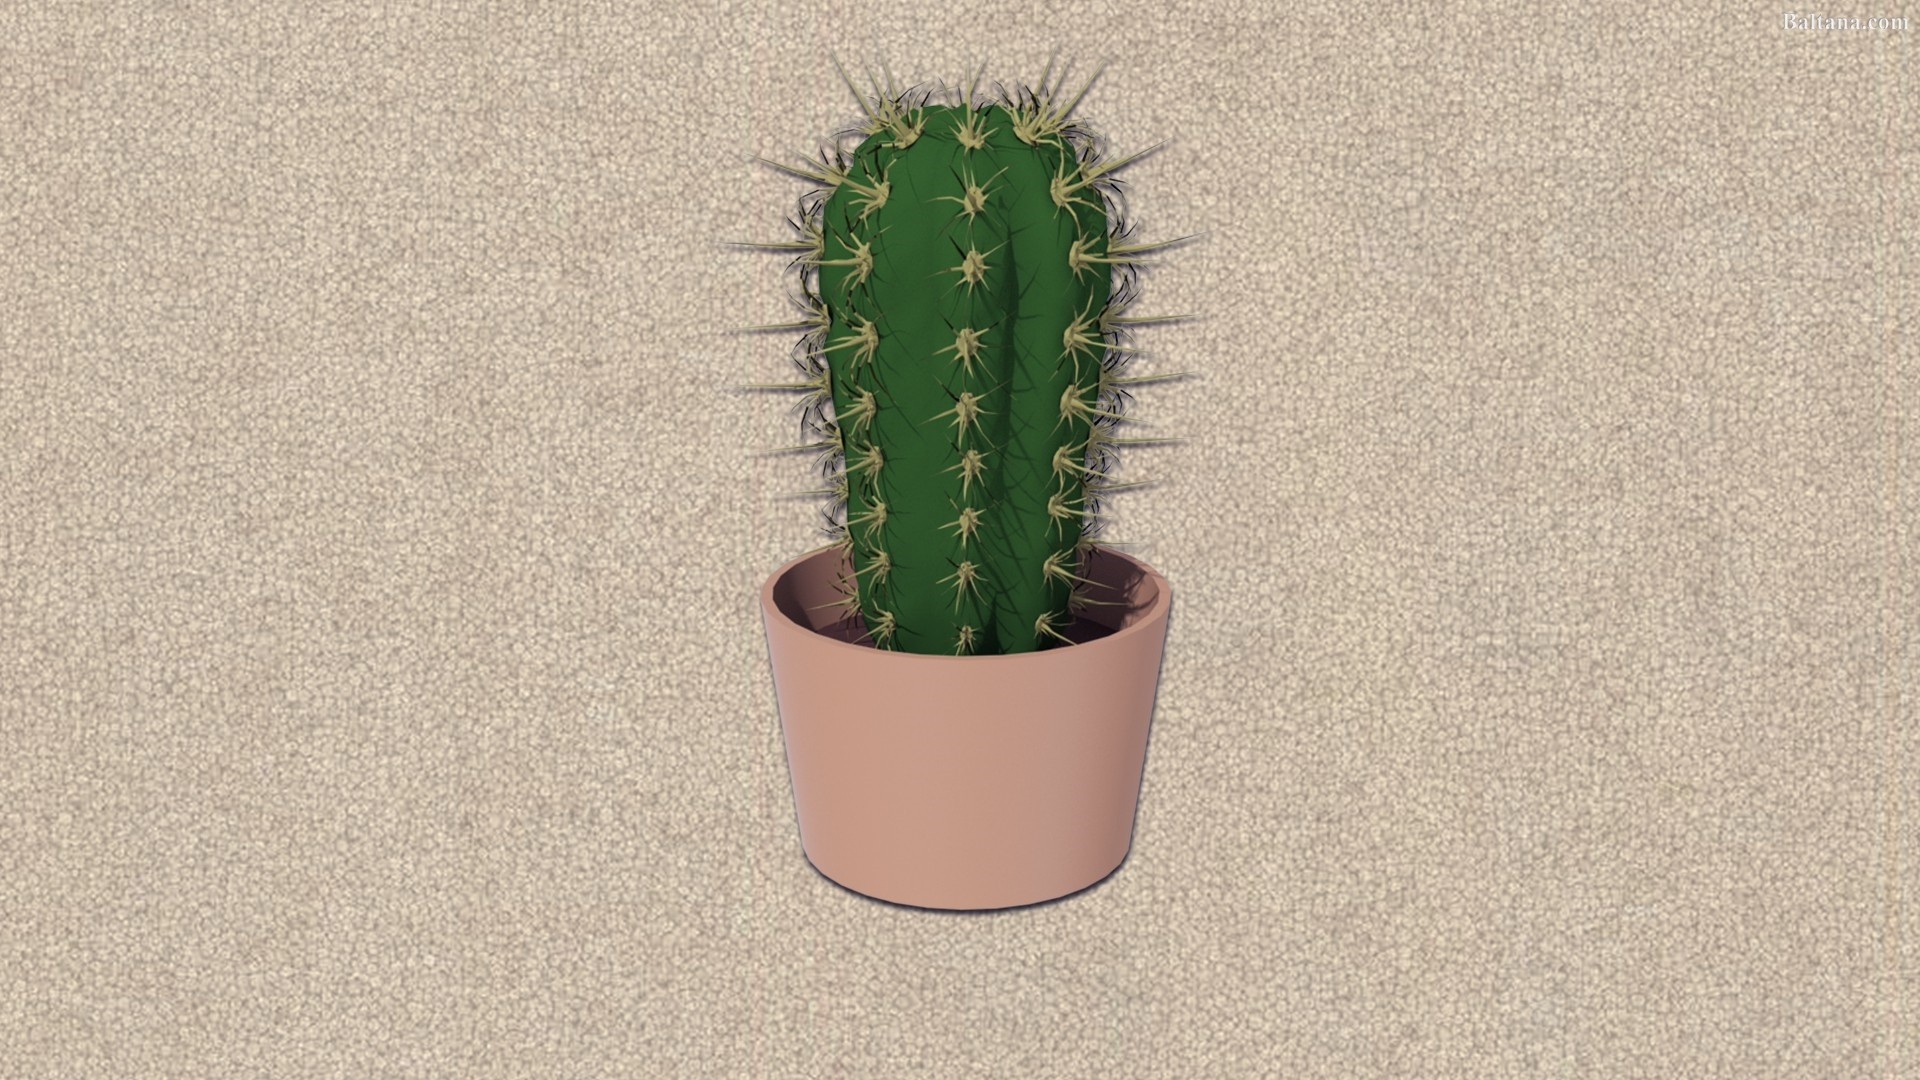 Cactus Minimalist Image